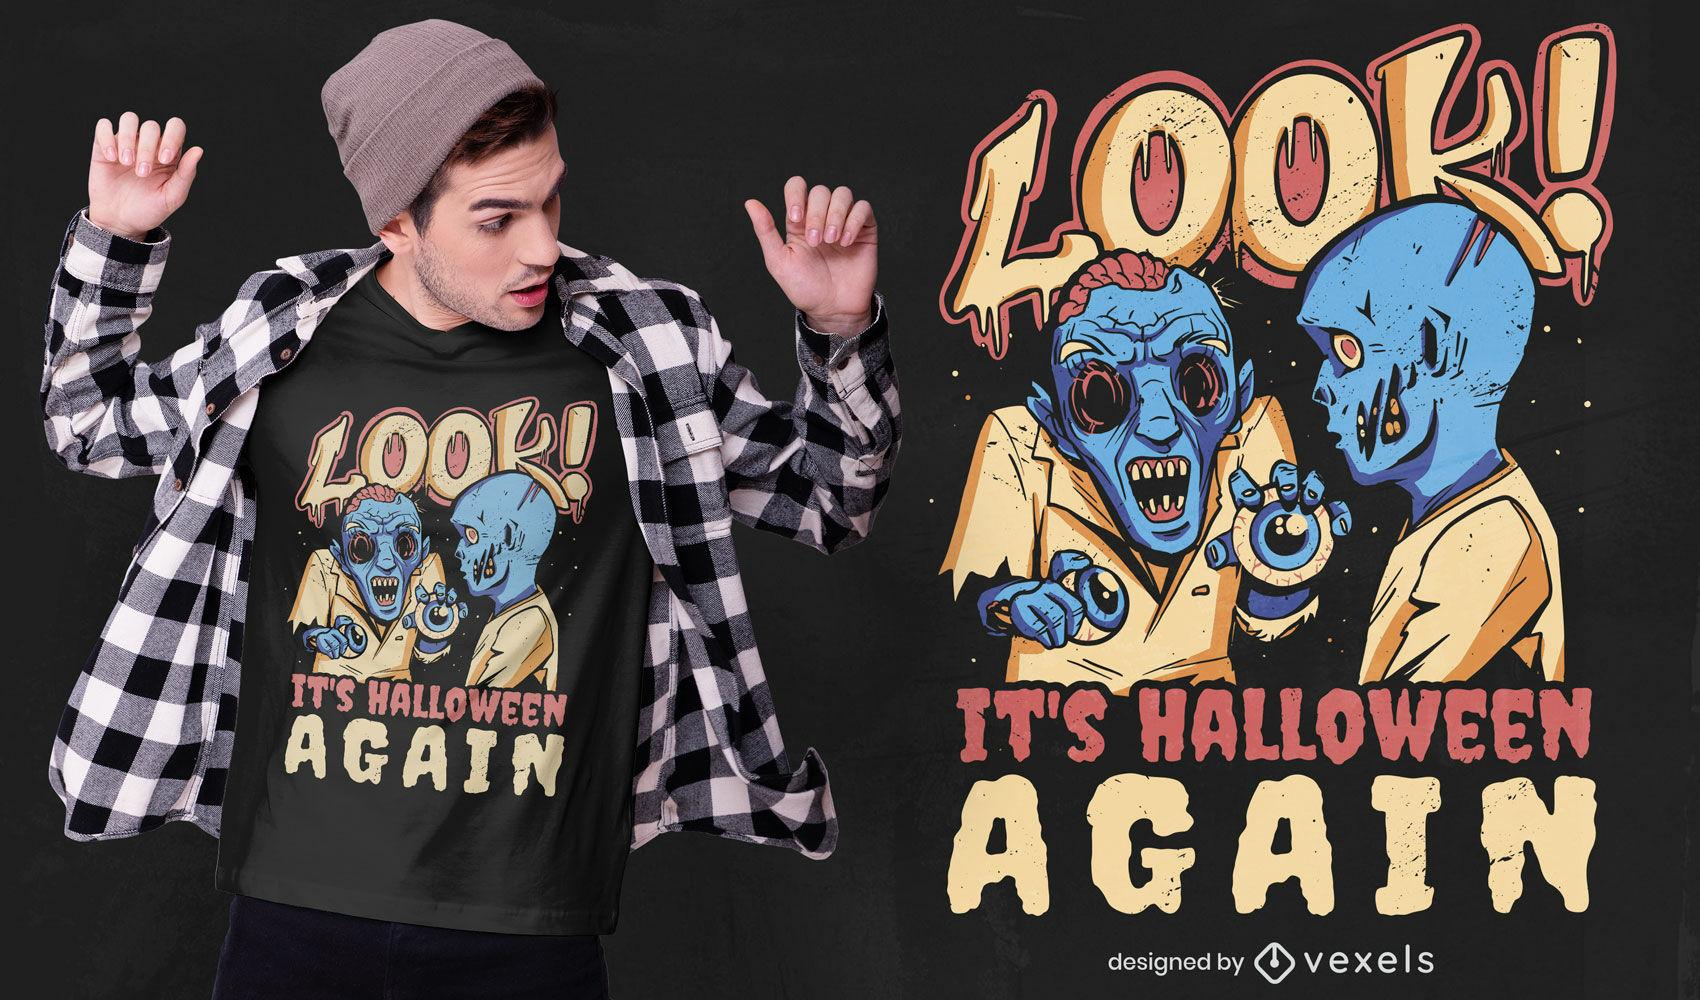 Halloween again zombies t-shirt design